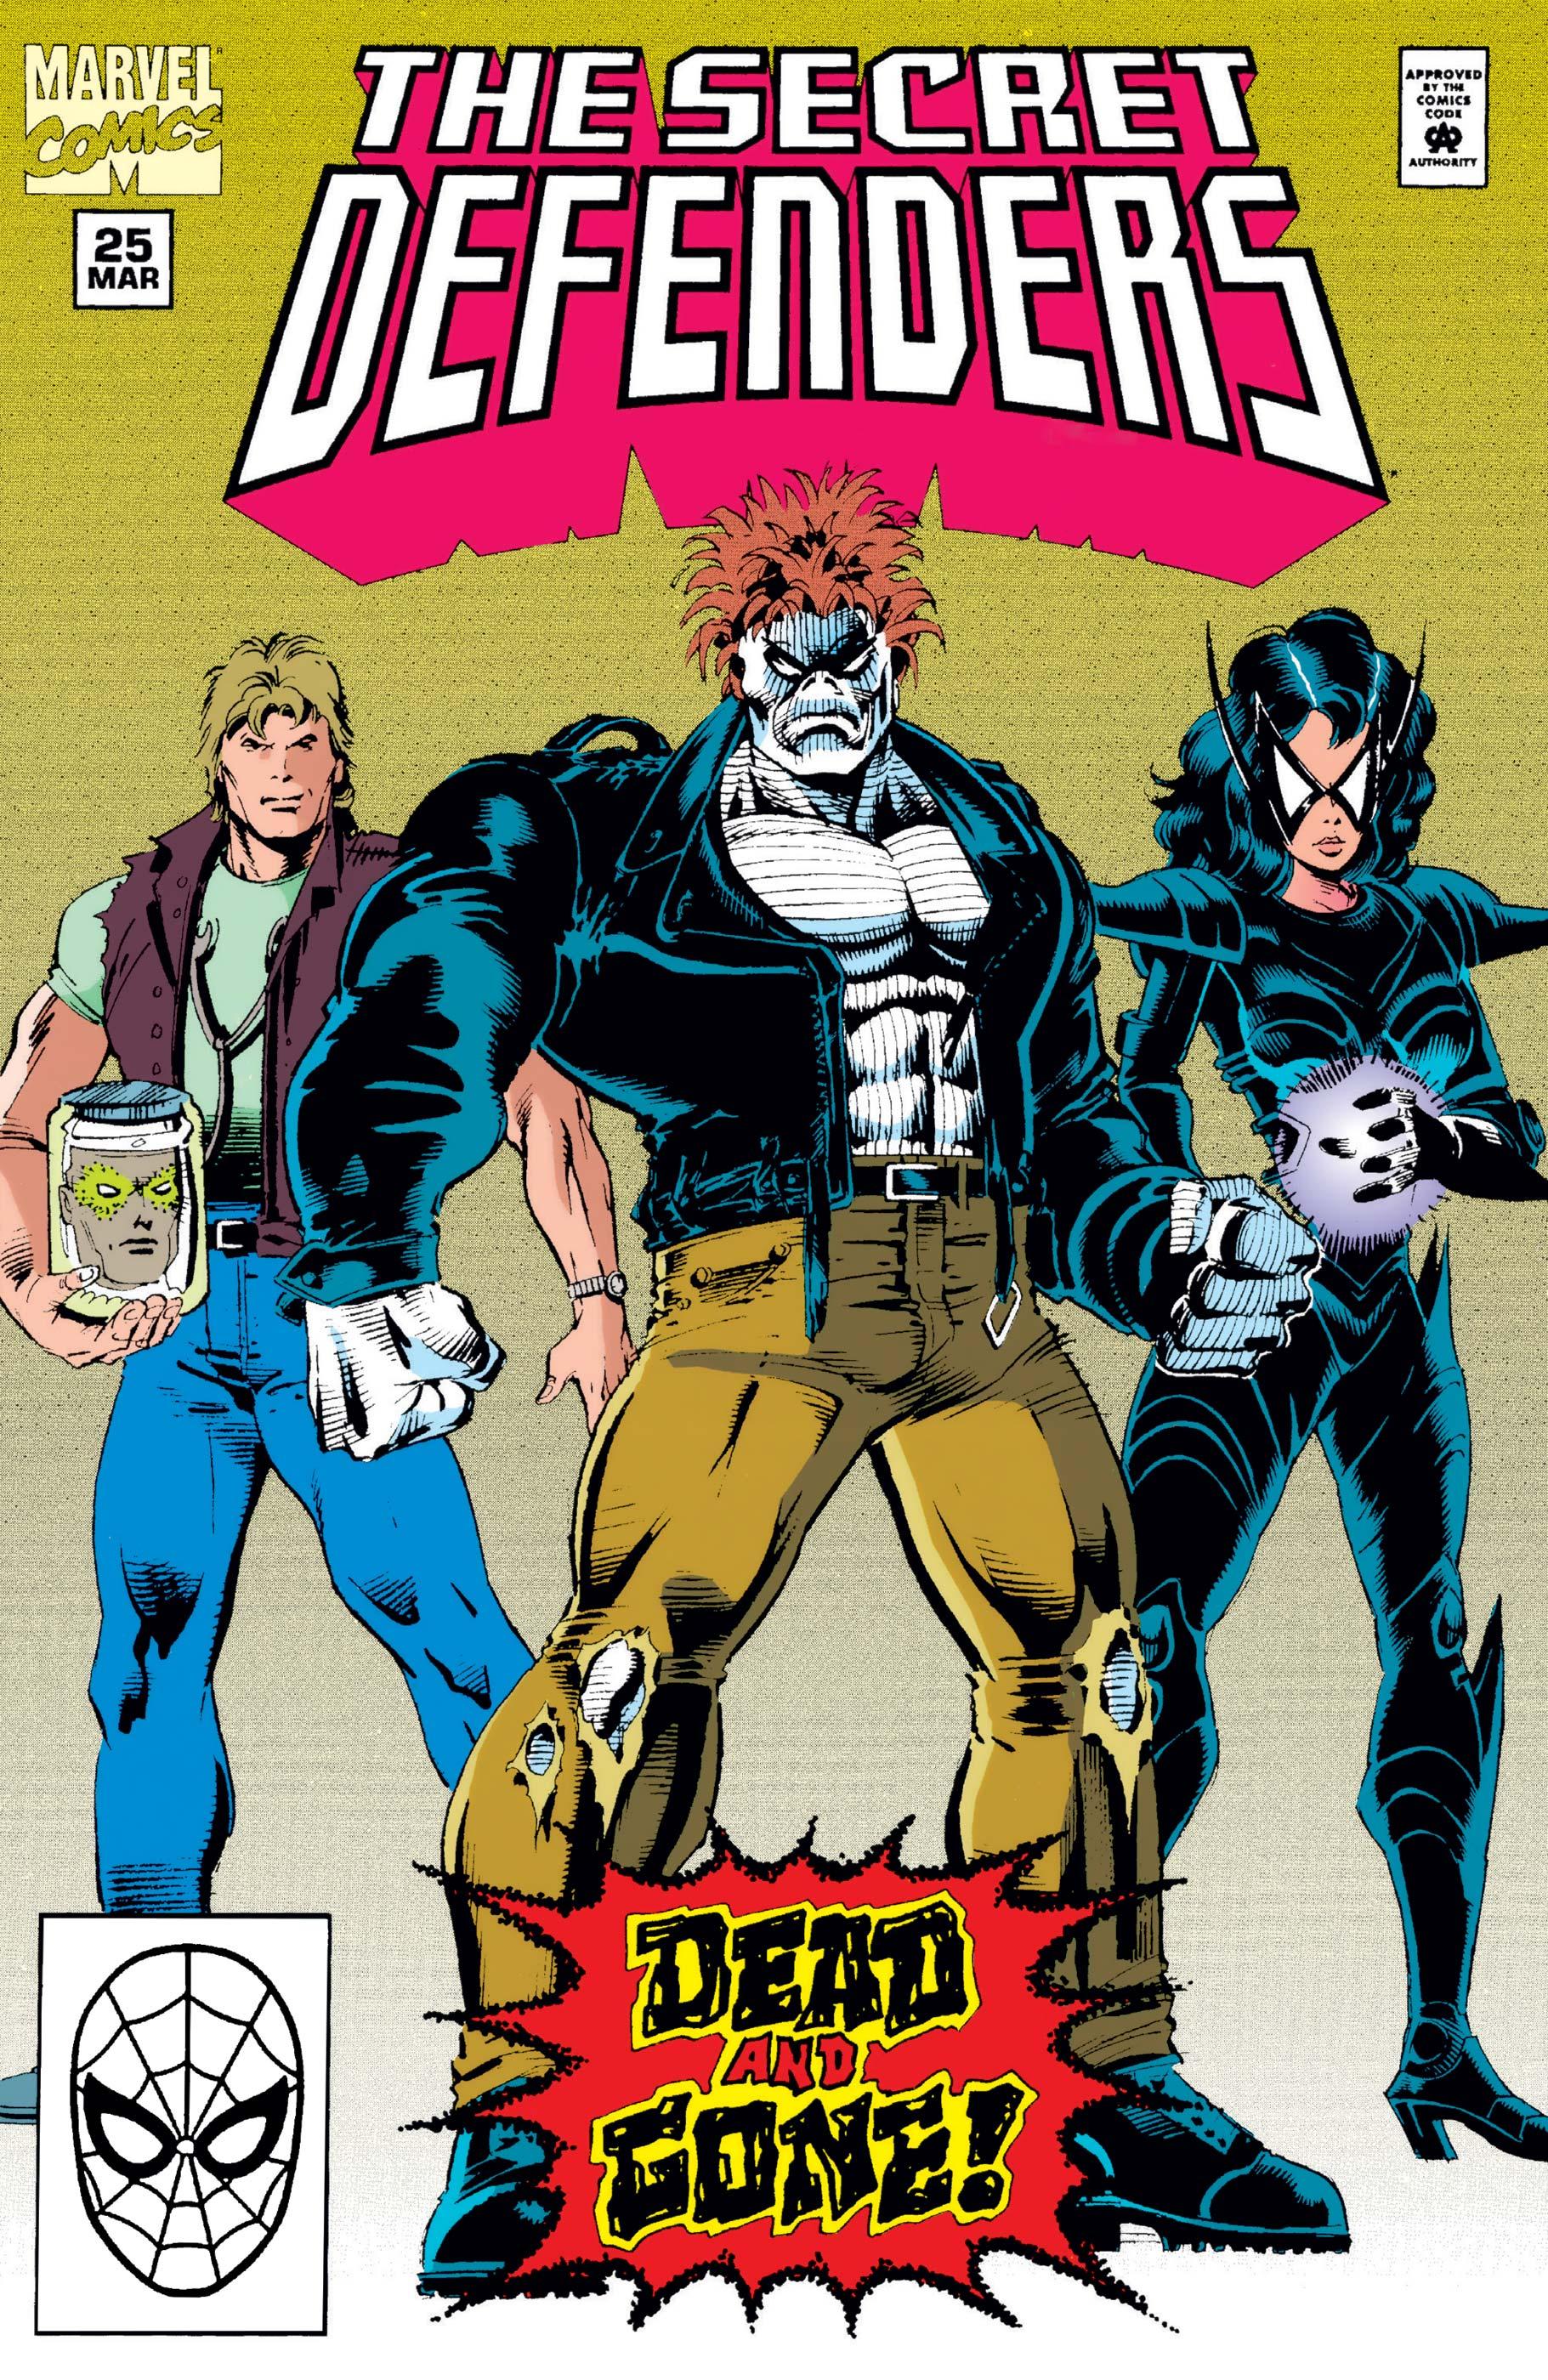 Secret Defenders (1993) #25